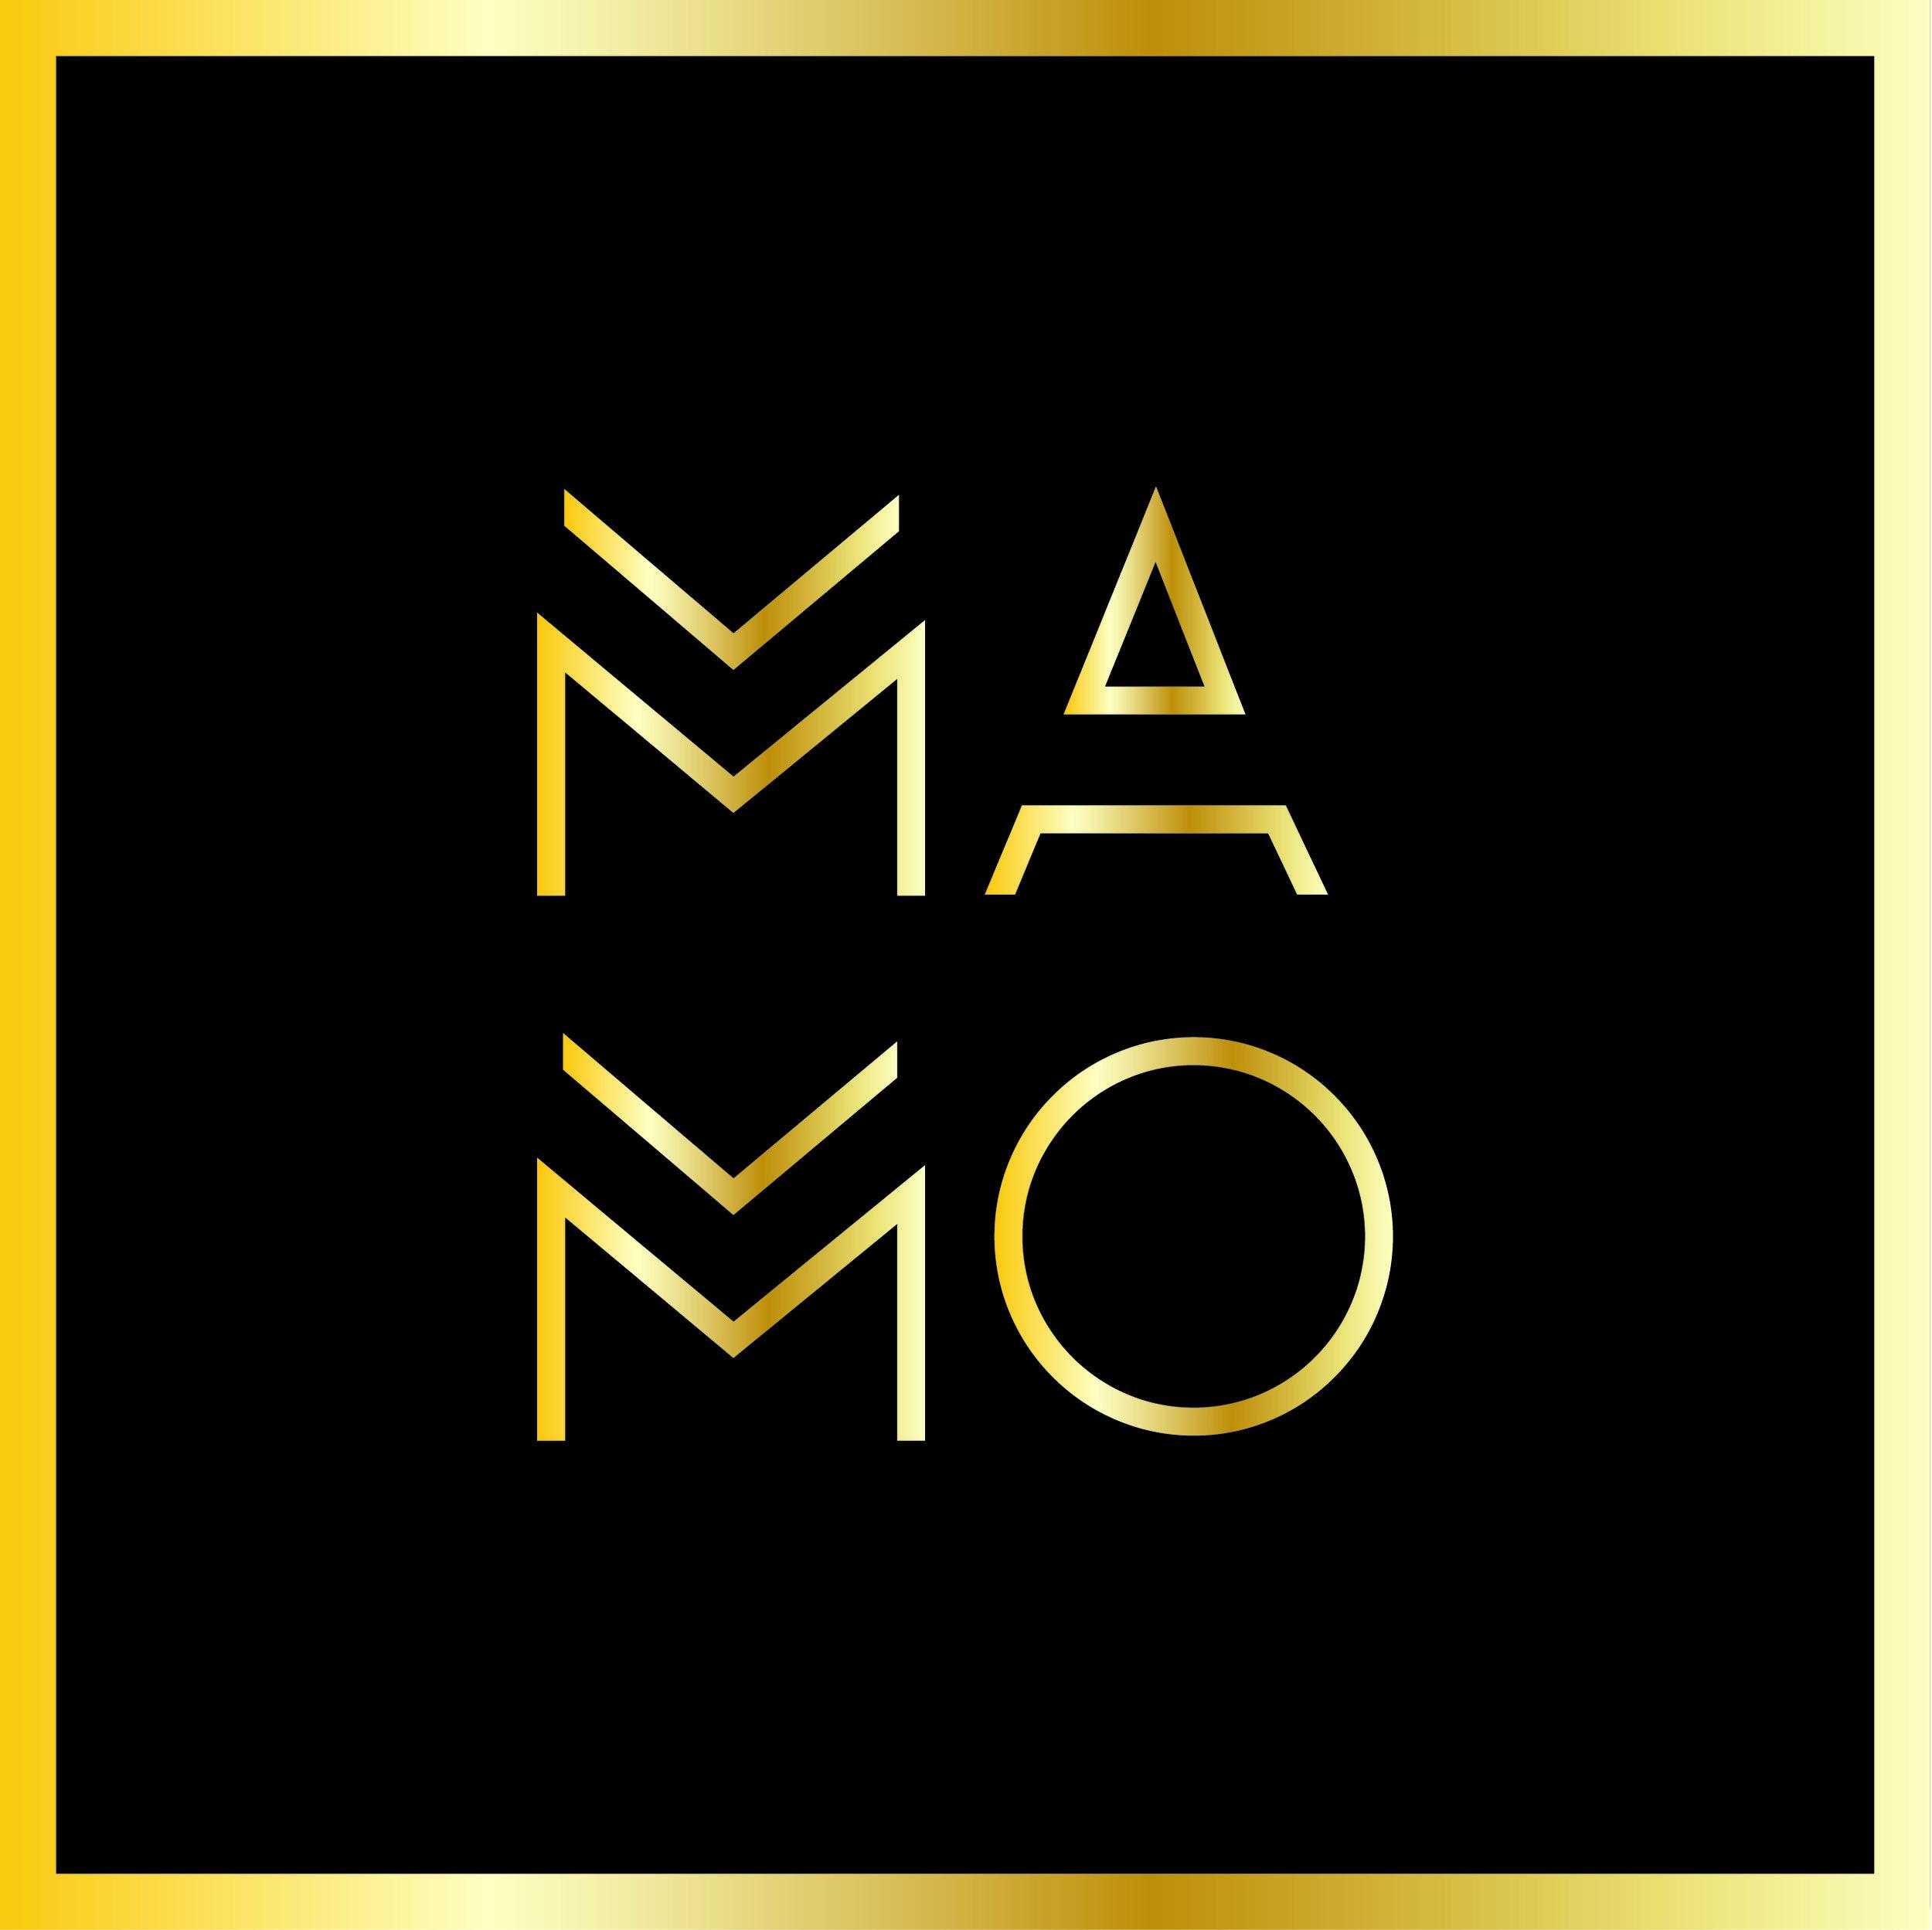 LOGO MAMO-01.jpg